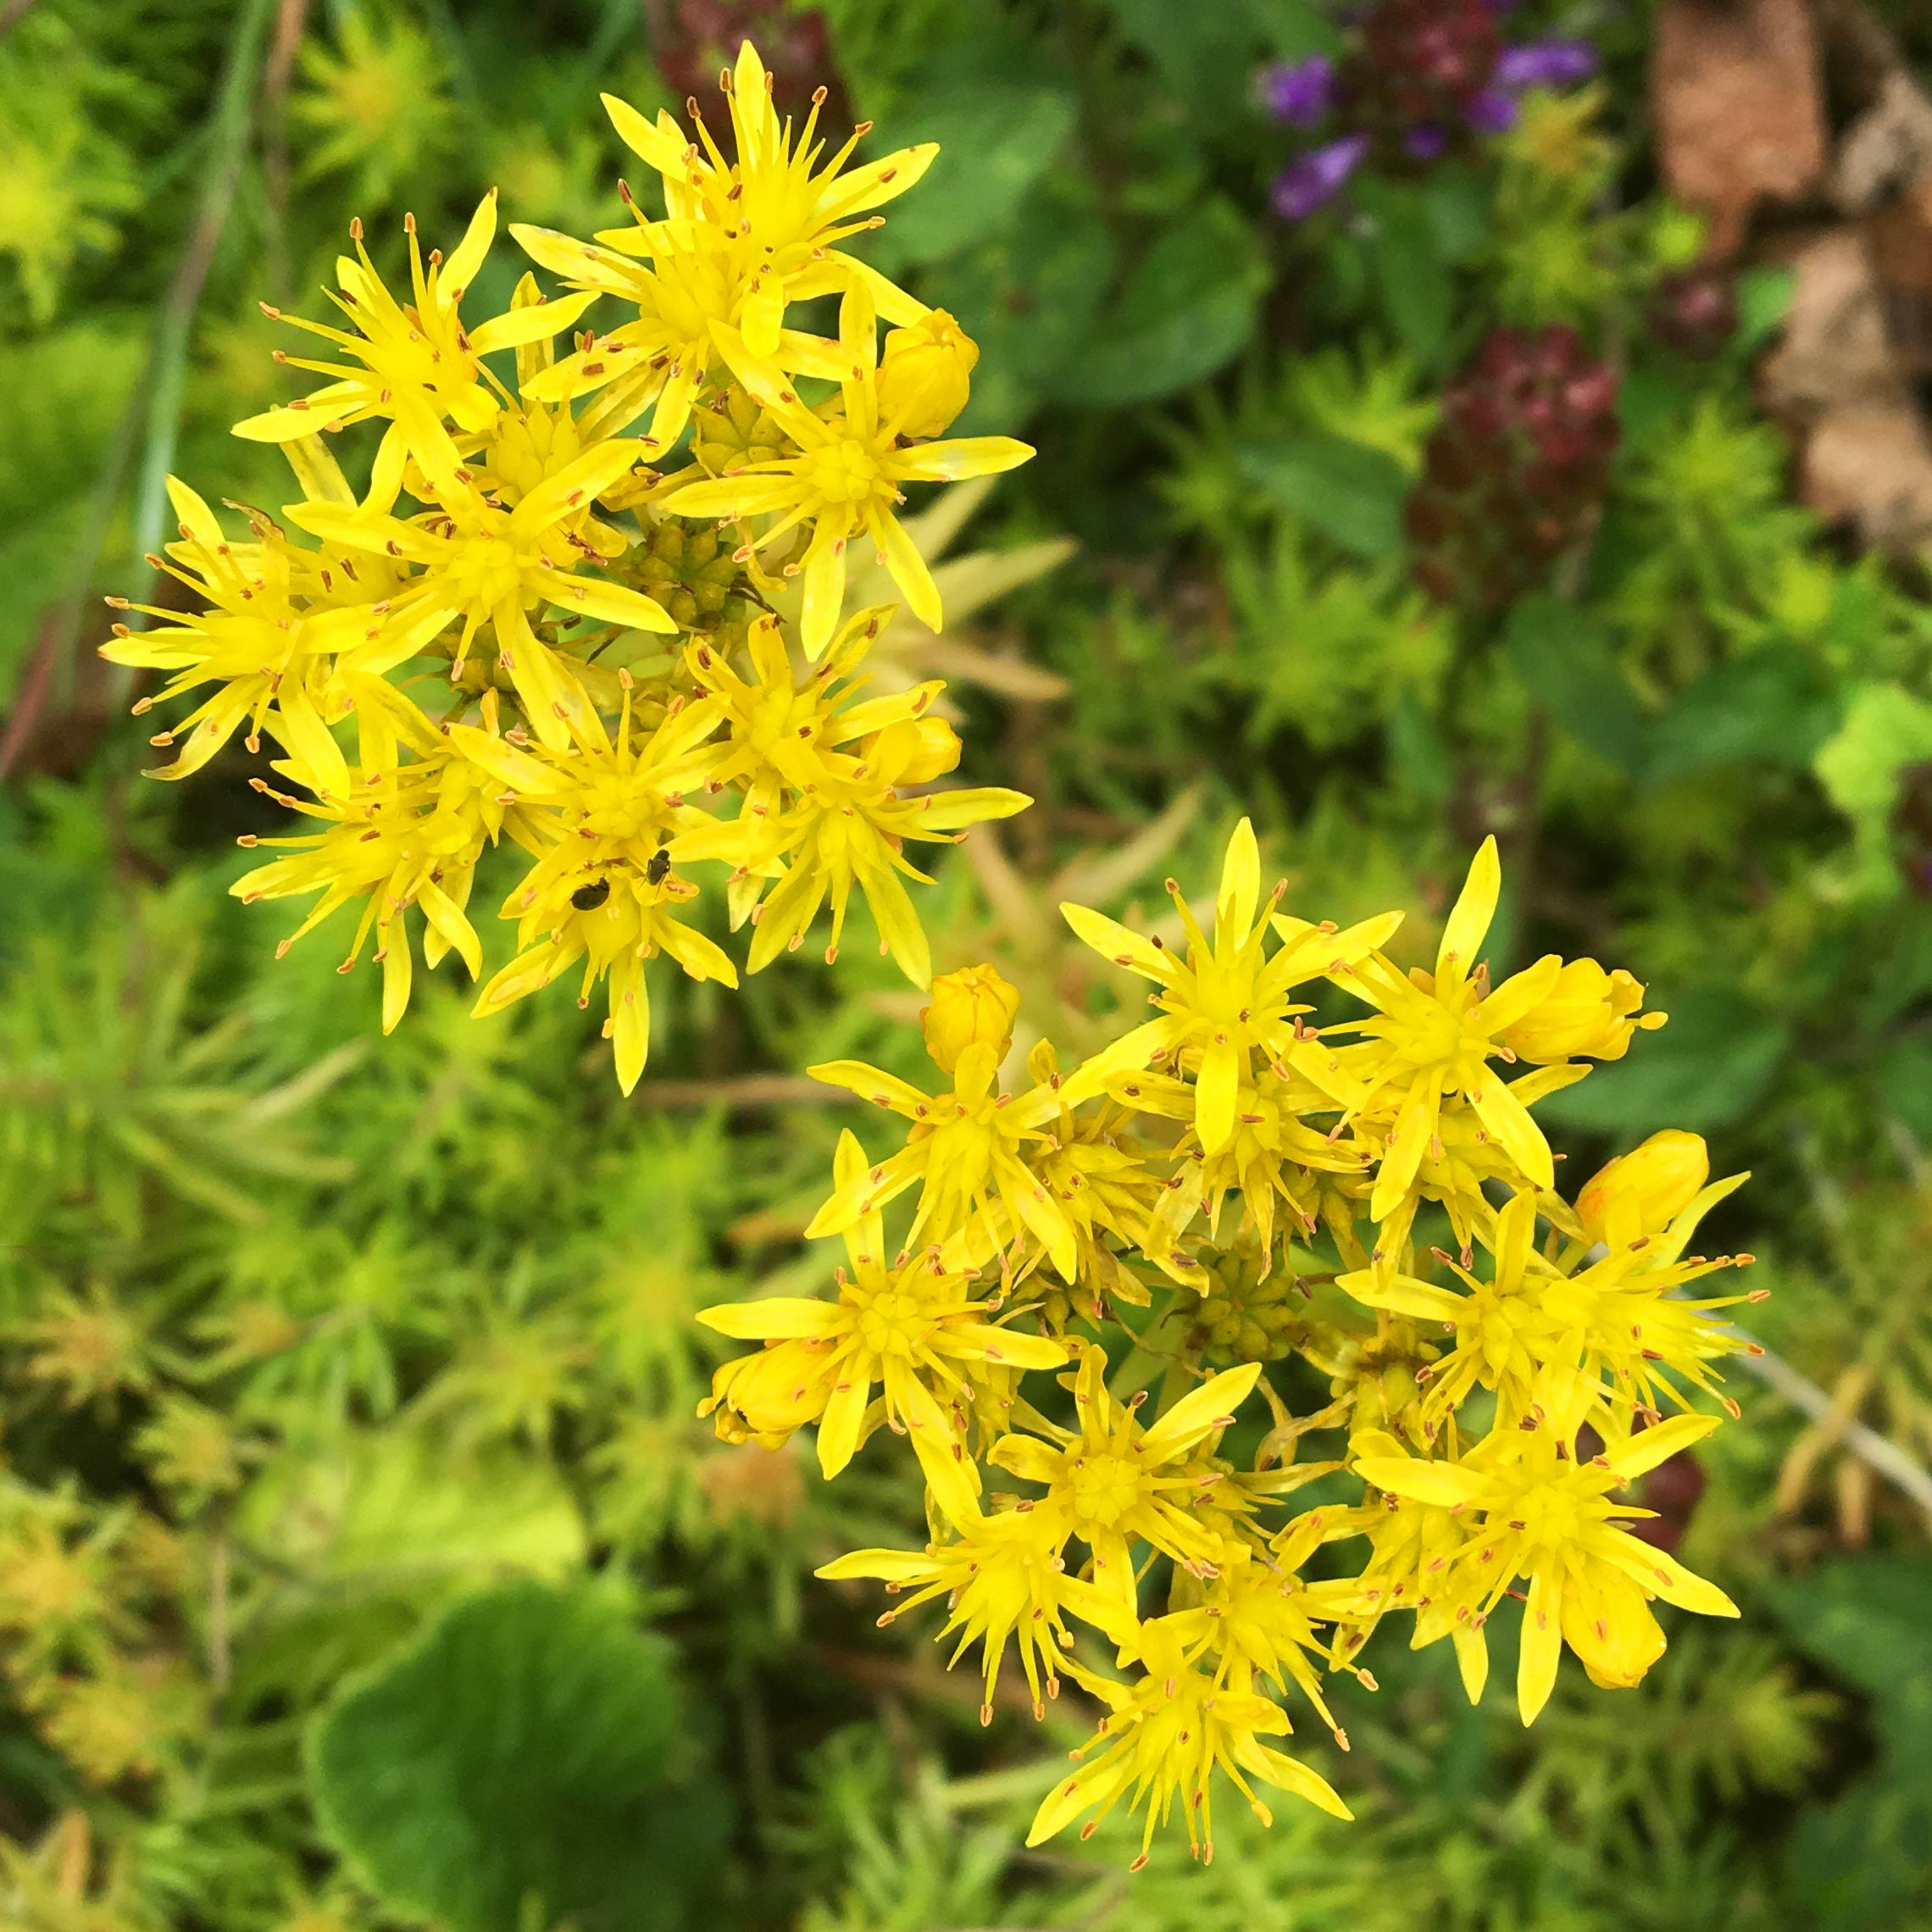 Sedum reflexum 'Aureum' with yellow flowers